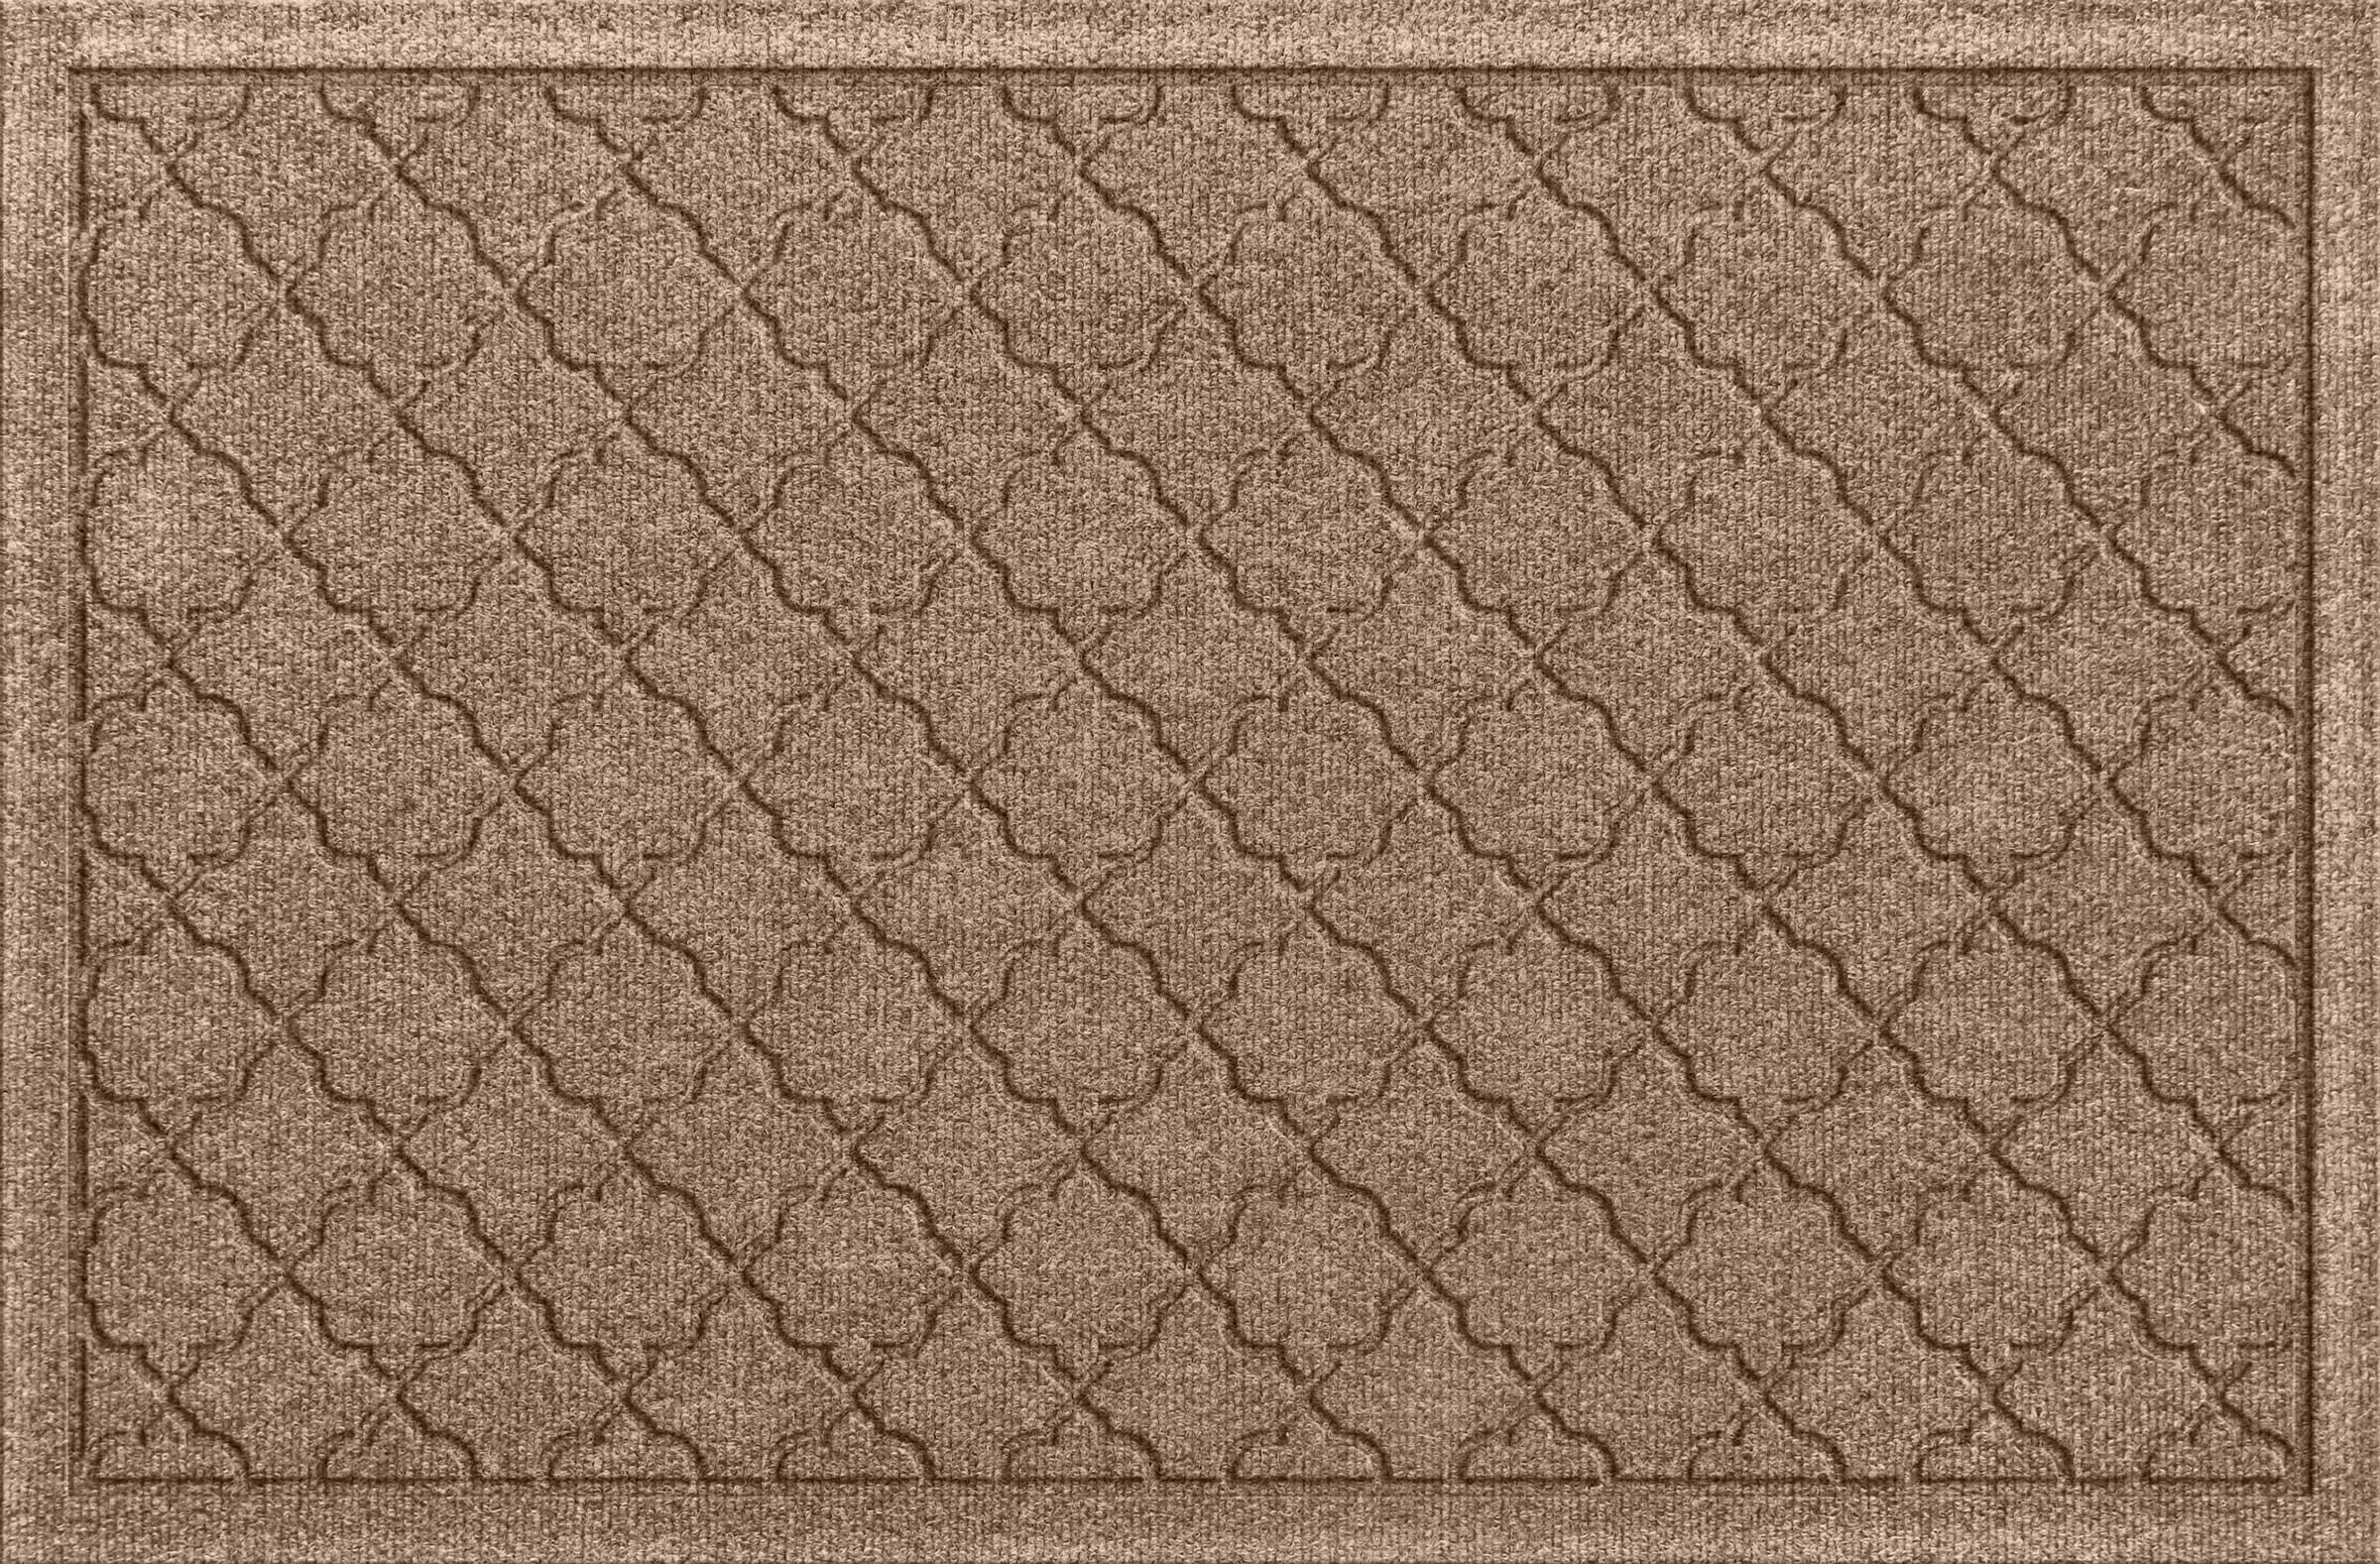 Bungalow Flooring Waterhog Doormat, 2' x 3', Skid Resistant, Easy to Clean, Catches Water and Debris, Cordova Collection, Khaki/Camel